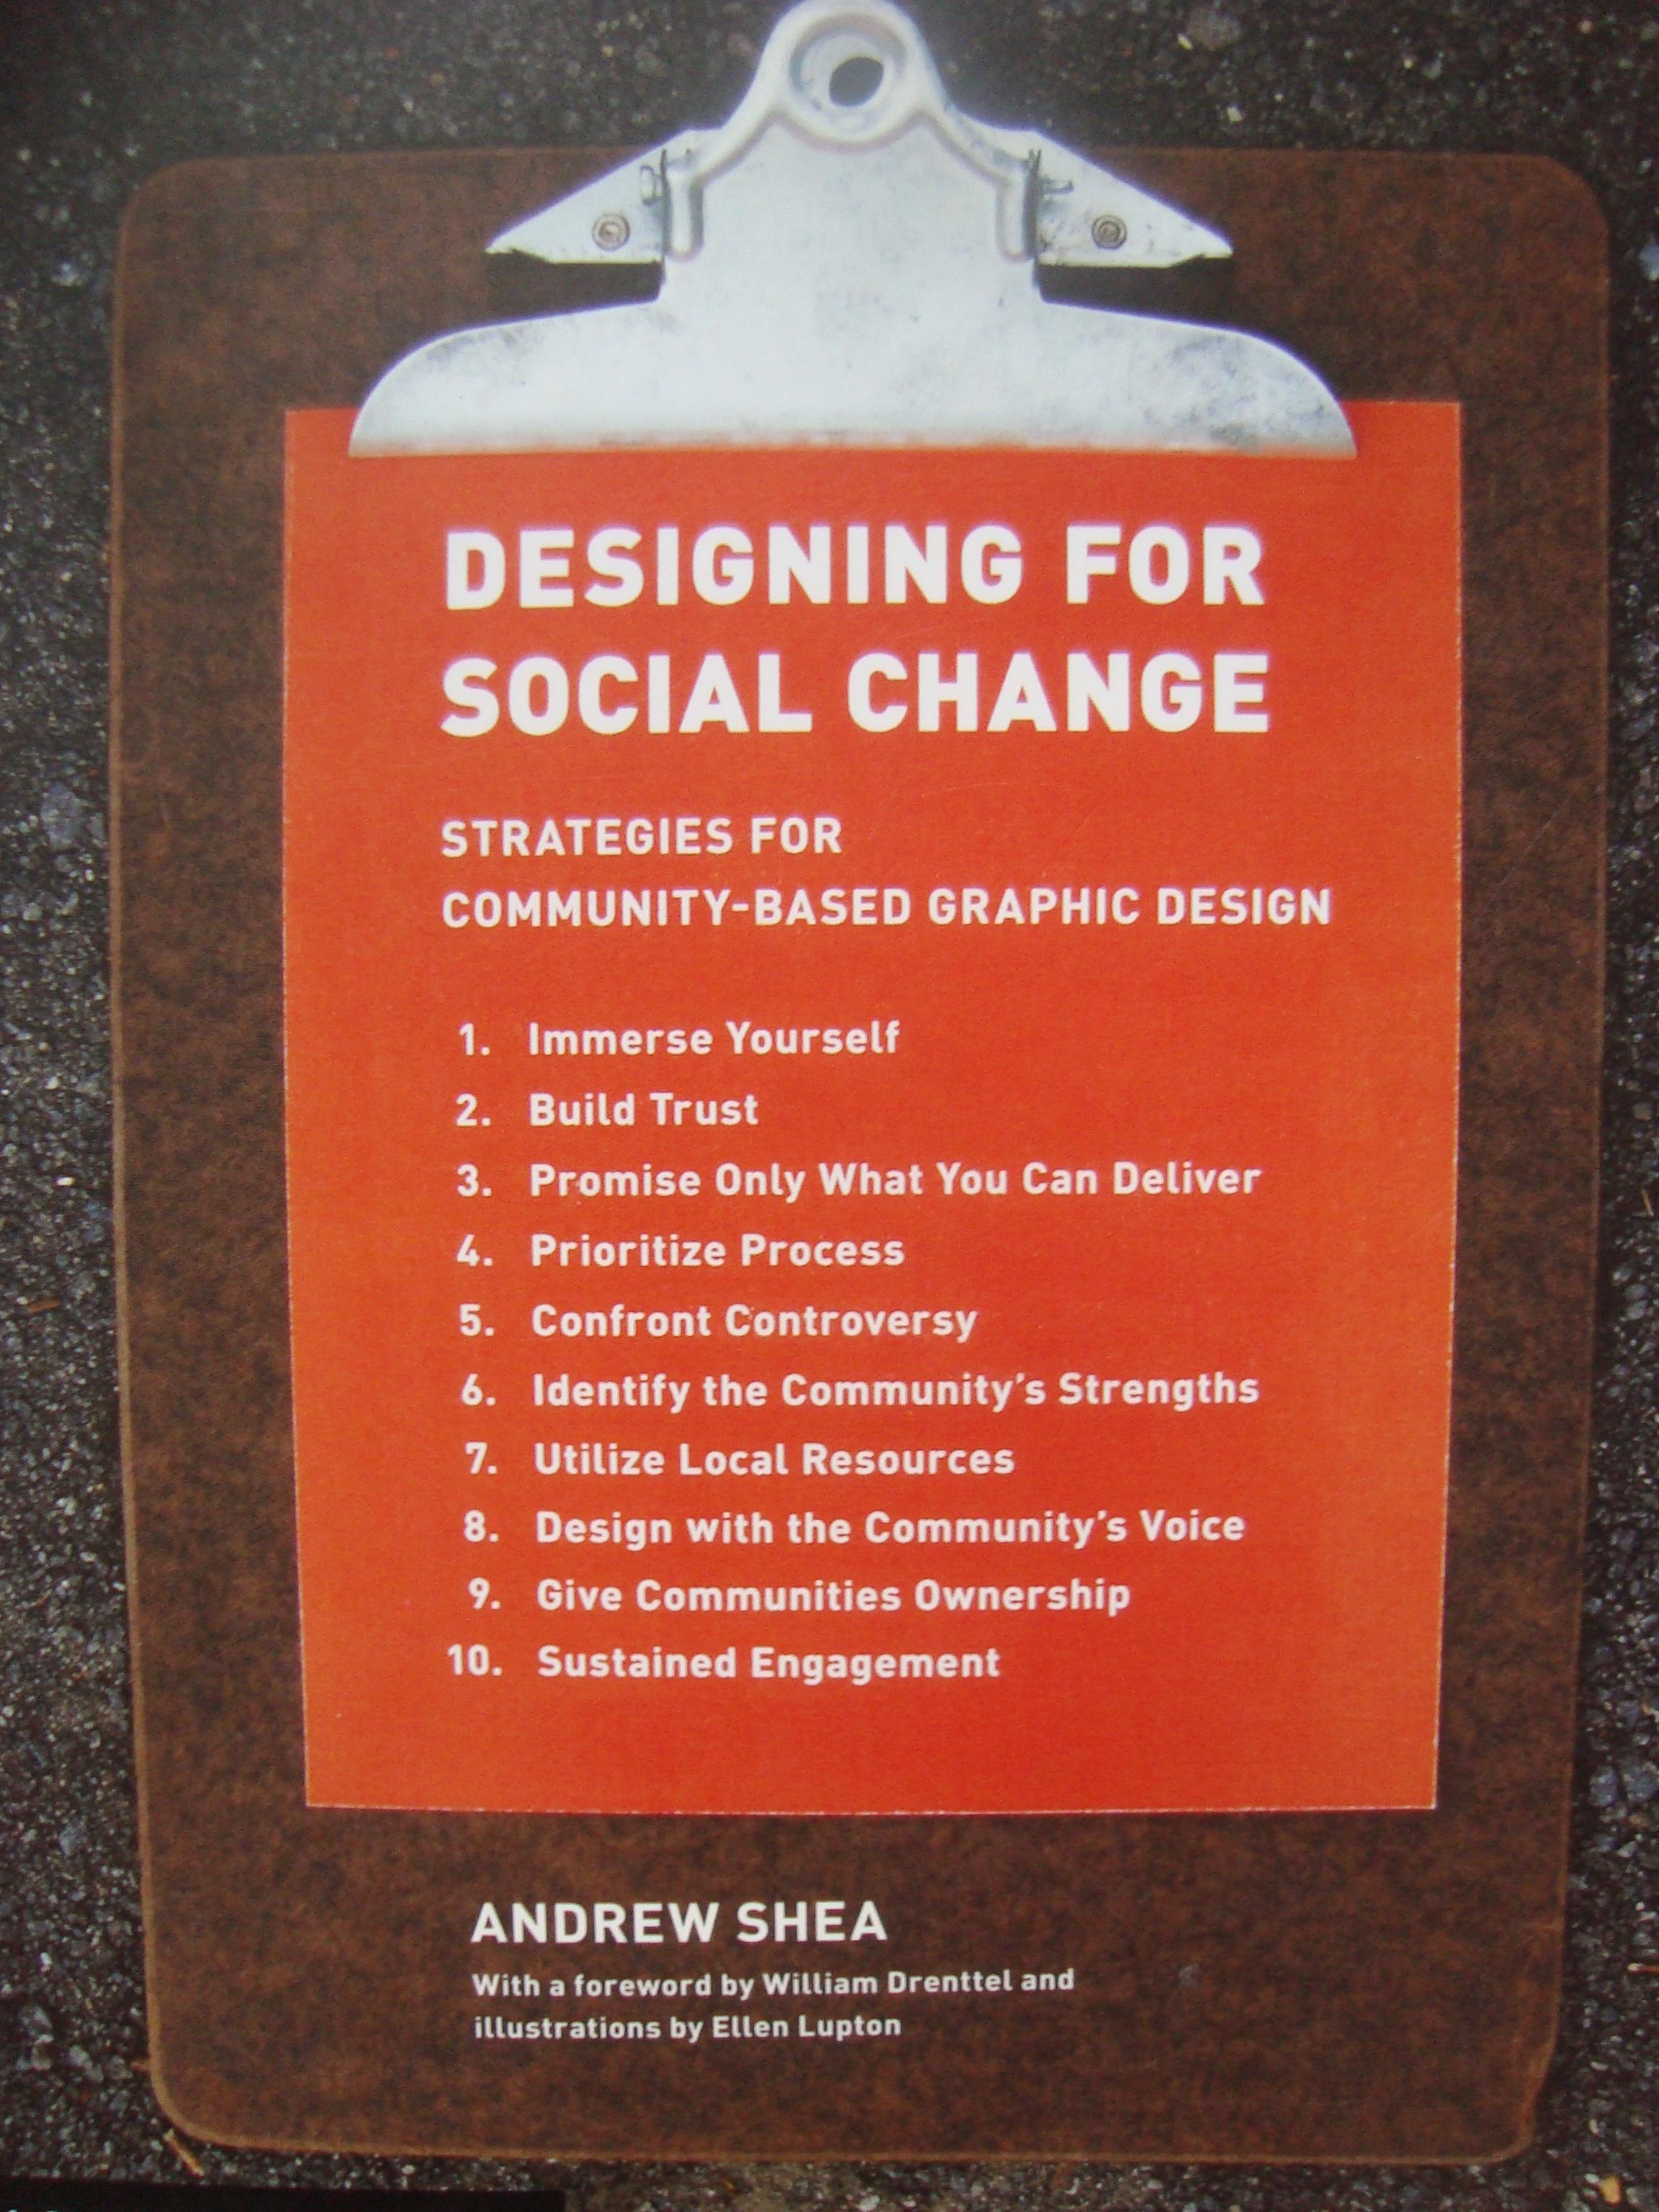 designing-for-social-change_strategies-cover.jpg